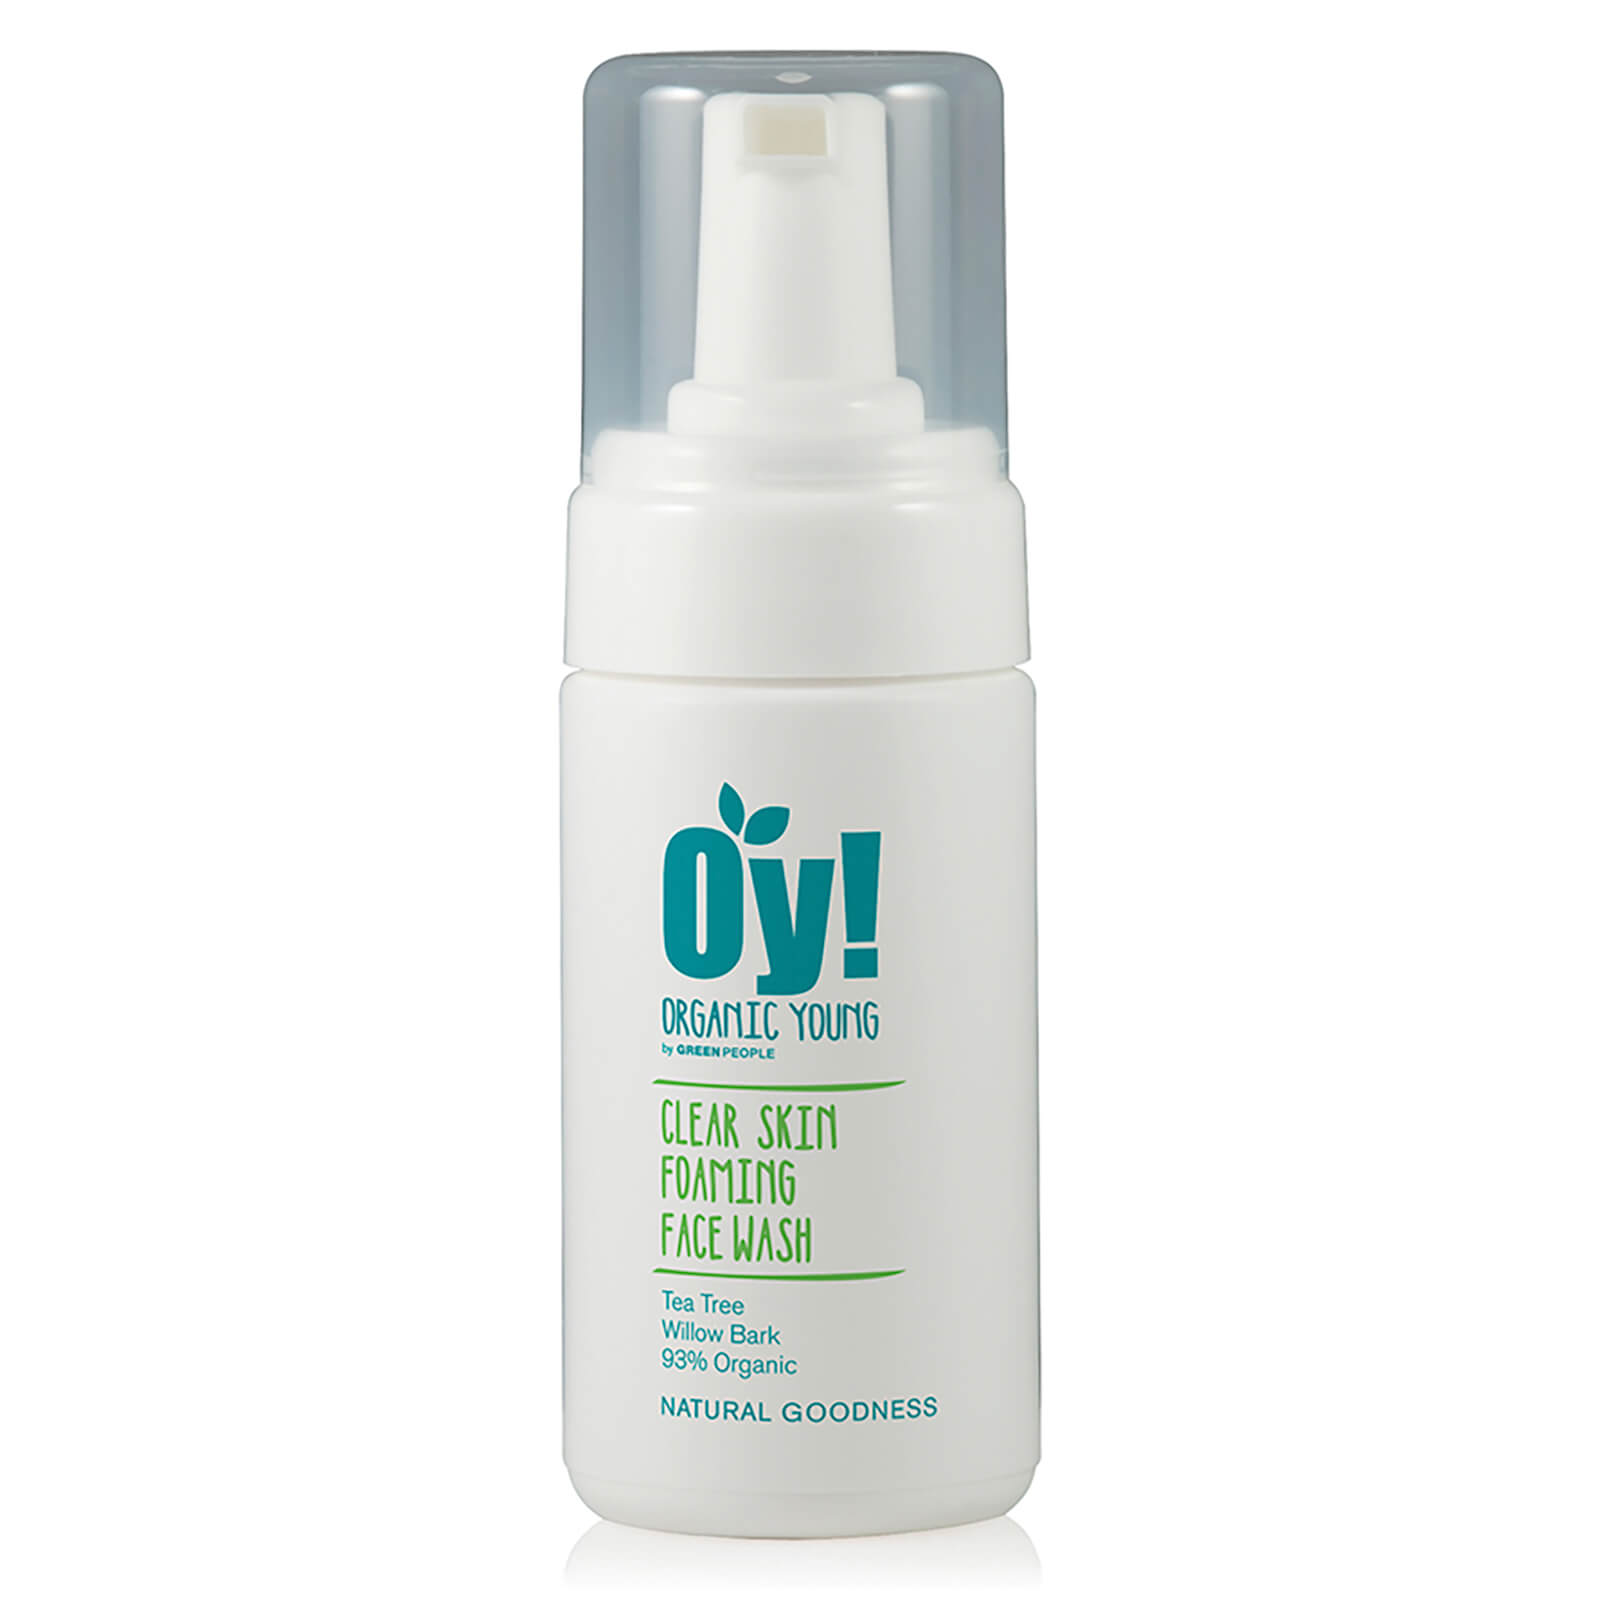 Купить Антибактериальная пенка для умывания Green People Oy! Foaming Anti-Bac Face Wash (100 мл)